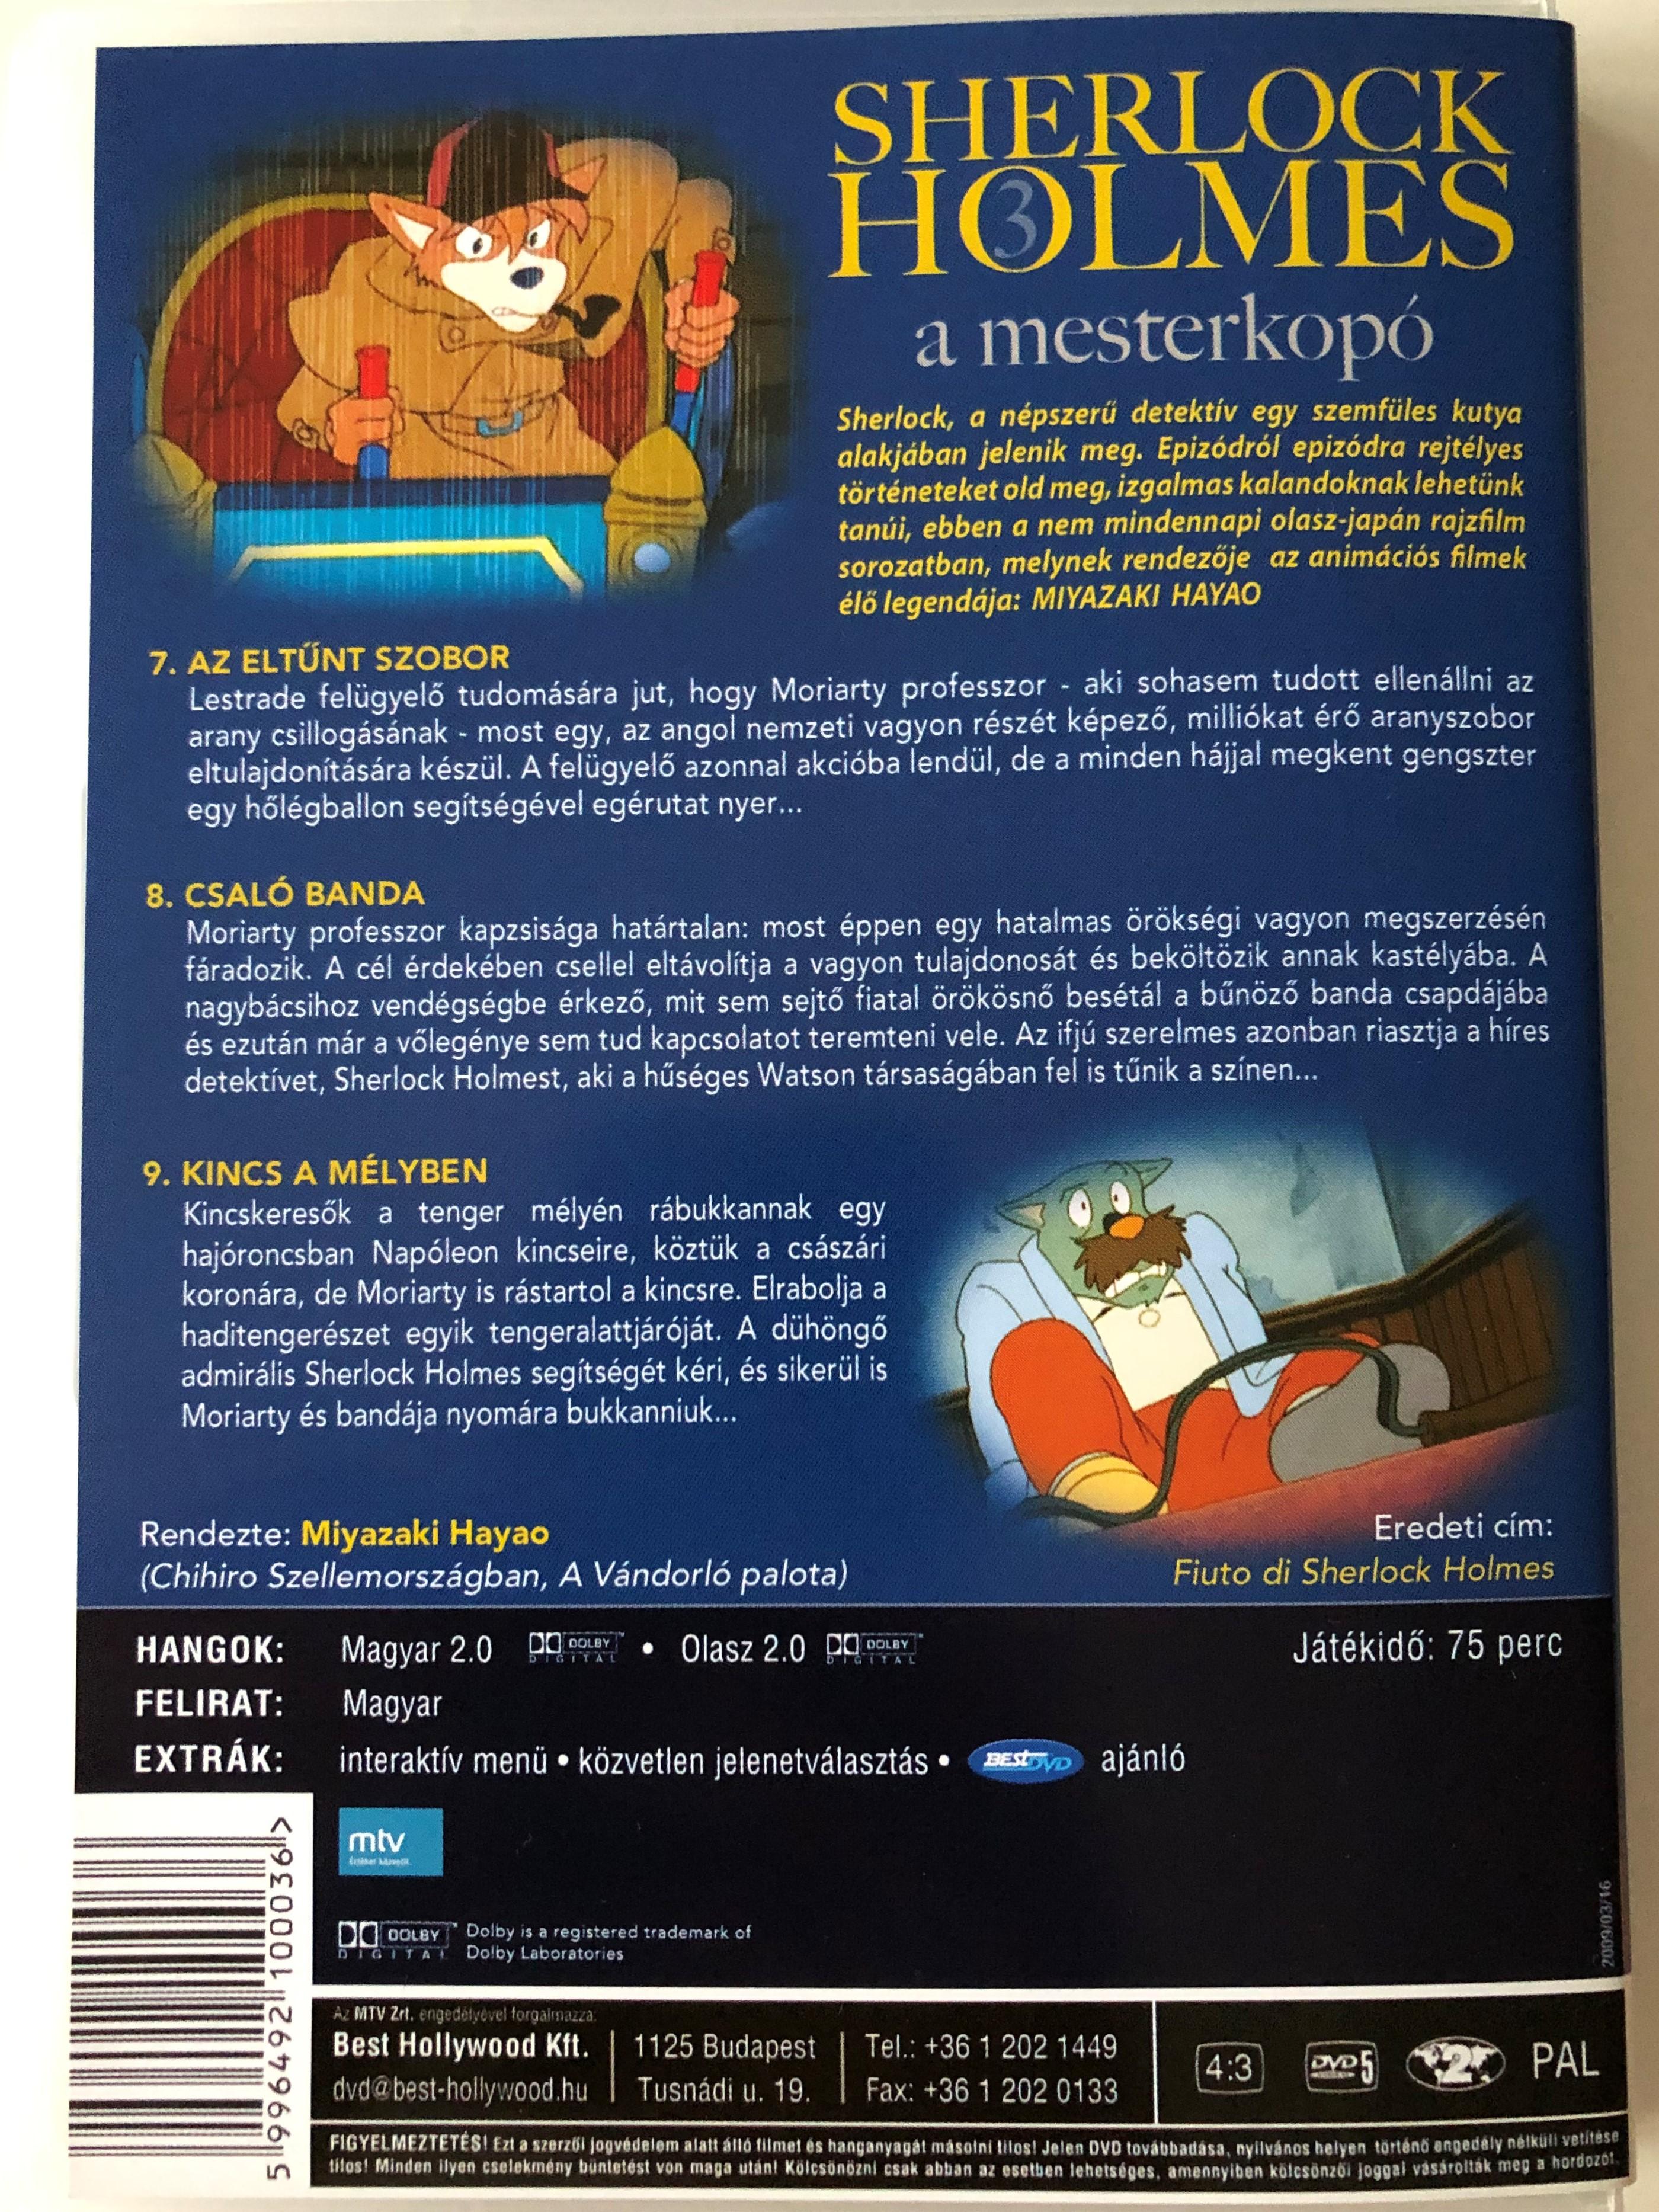 fiuto-di-sherlock-holmes-3.-dvd-1984-sherlock-holmes-a-mesterkop-2.jpg